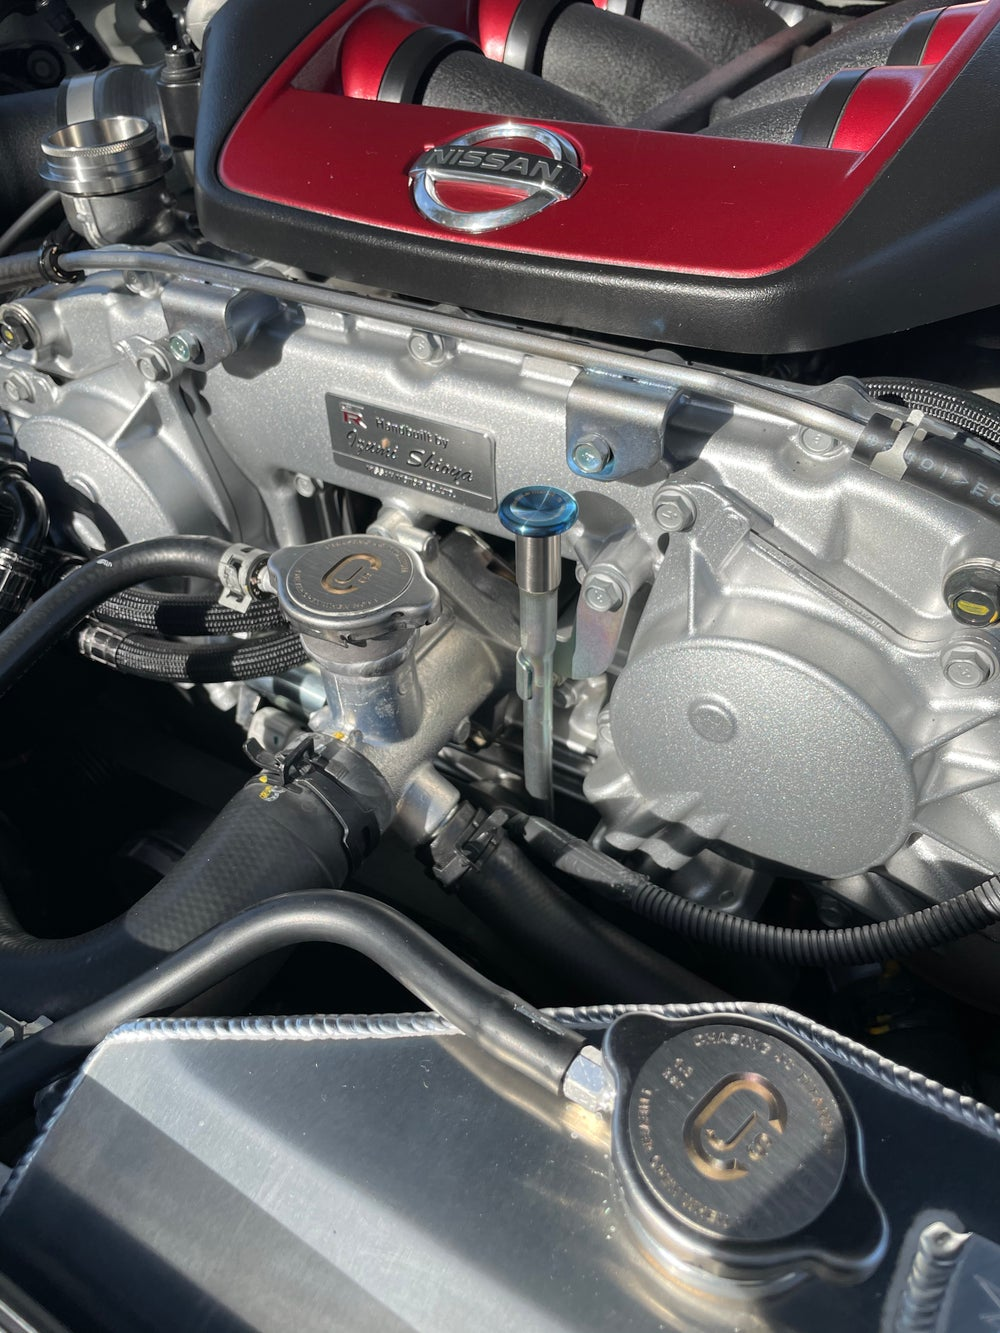 Nissan GTR, 370z, G37 dual radiator cap set.